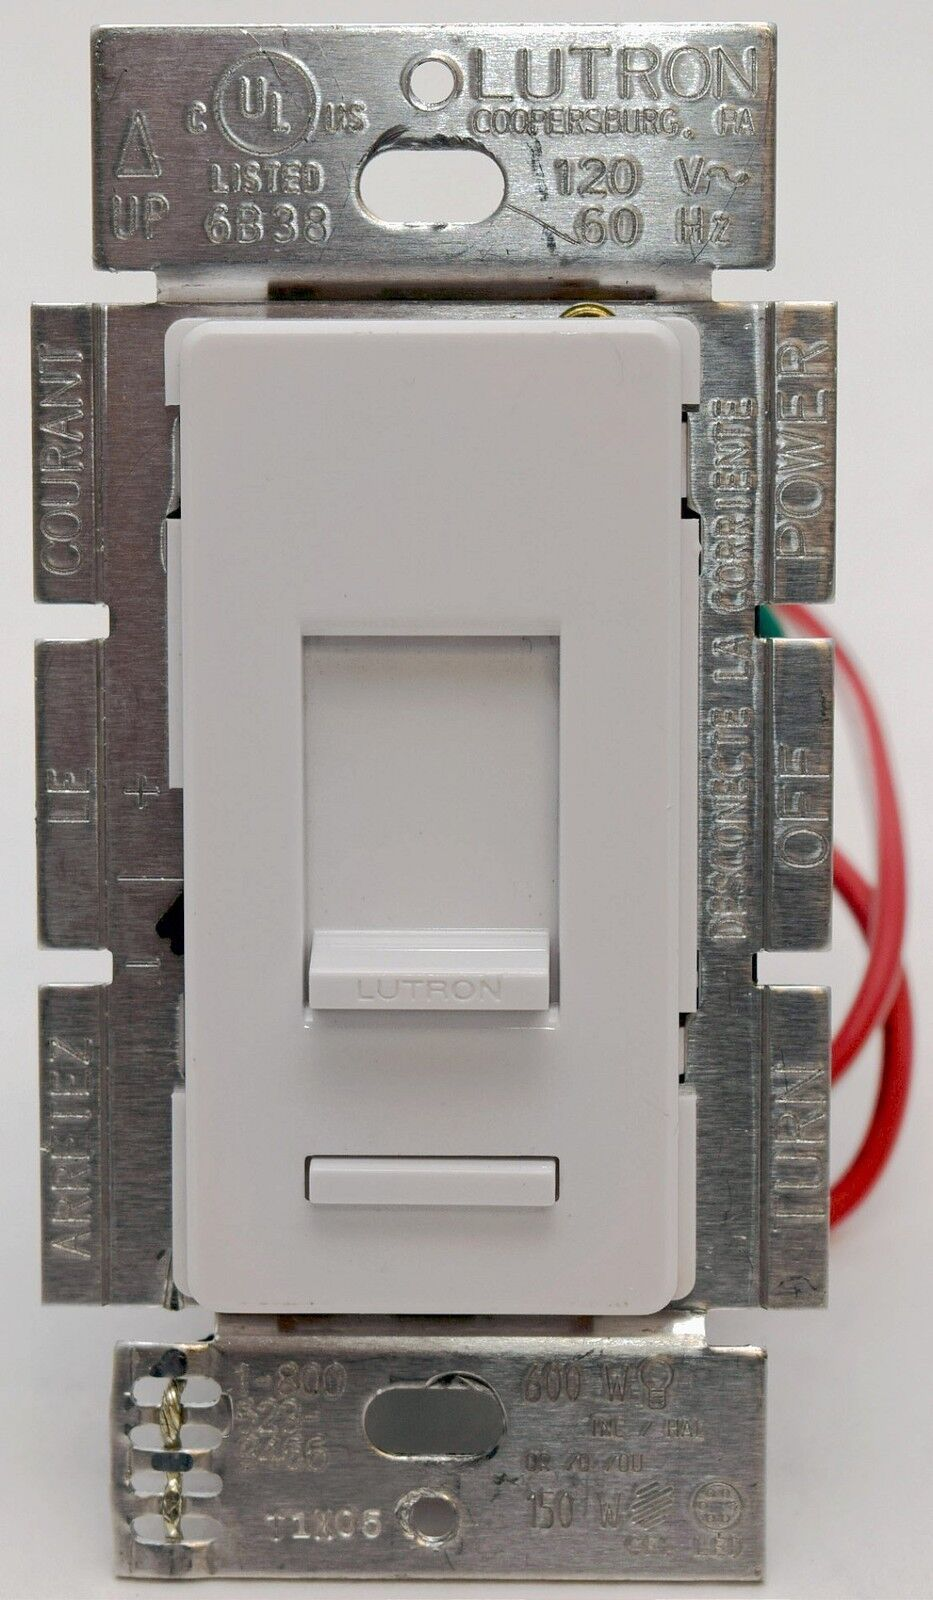 Lutron Lumea LGCL-153P 3-Way Single Pole CL Wall Dimmer Light Switch ...